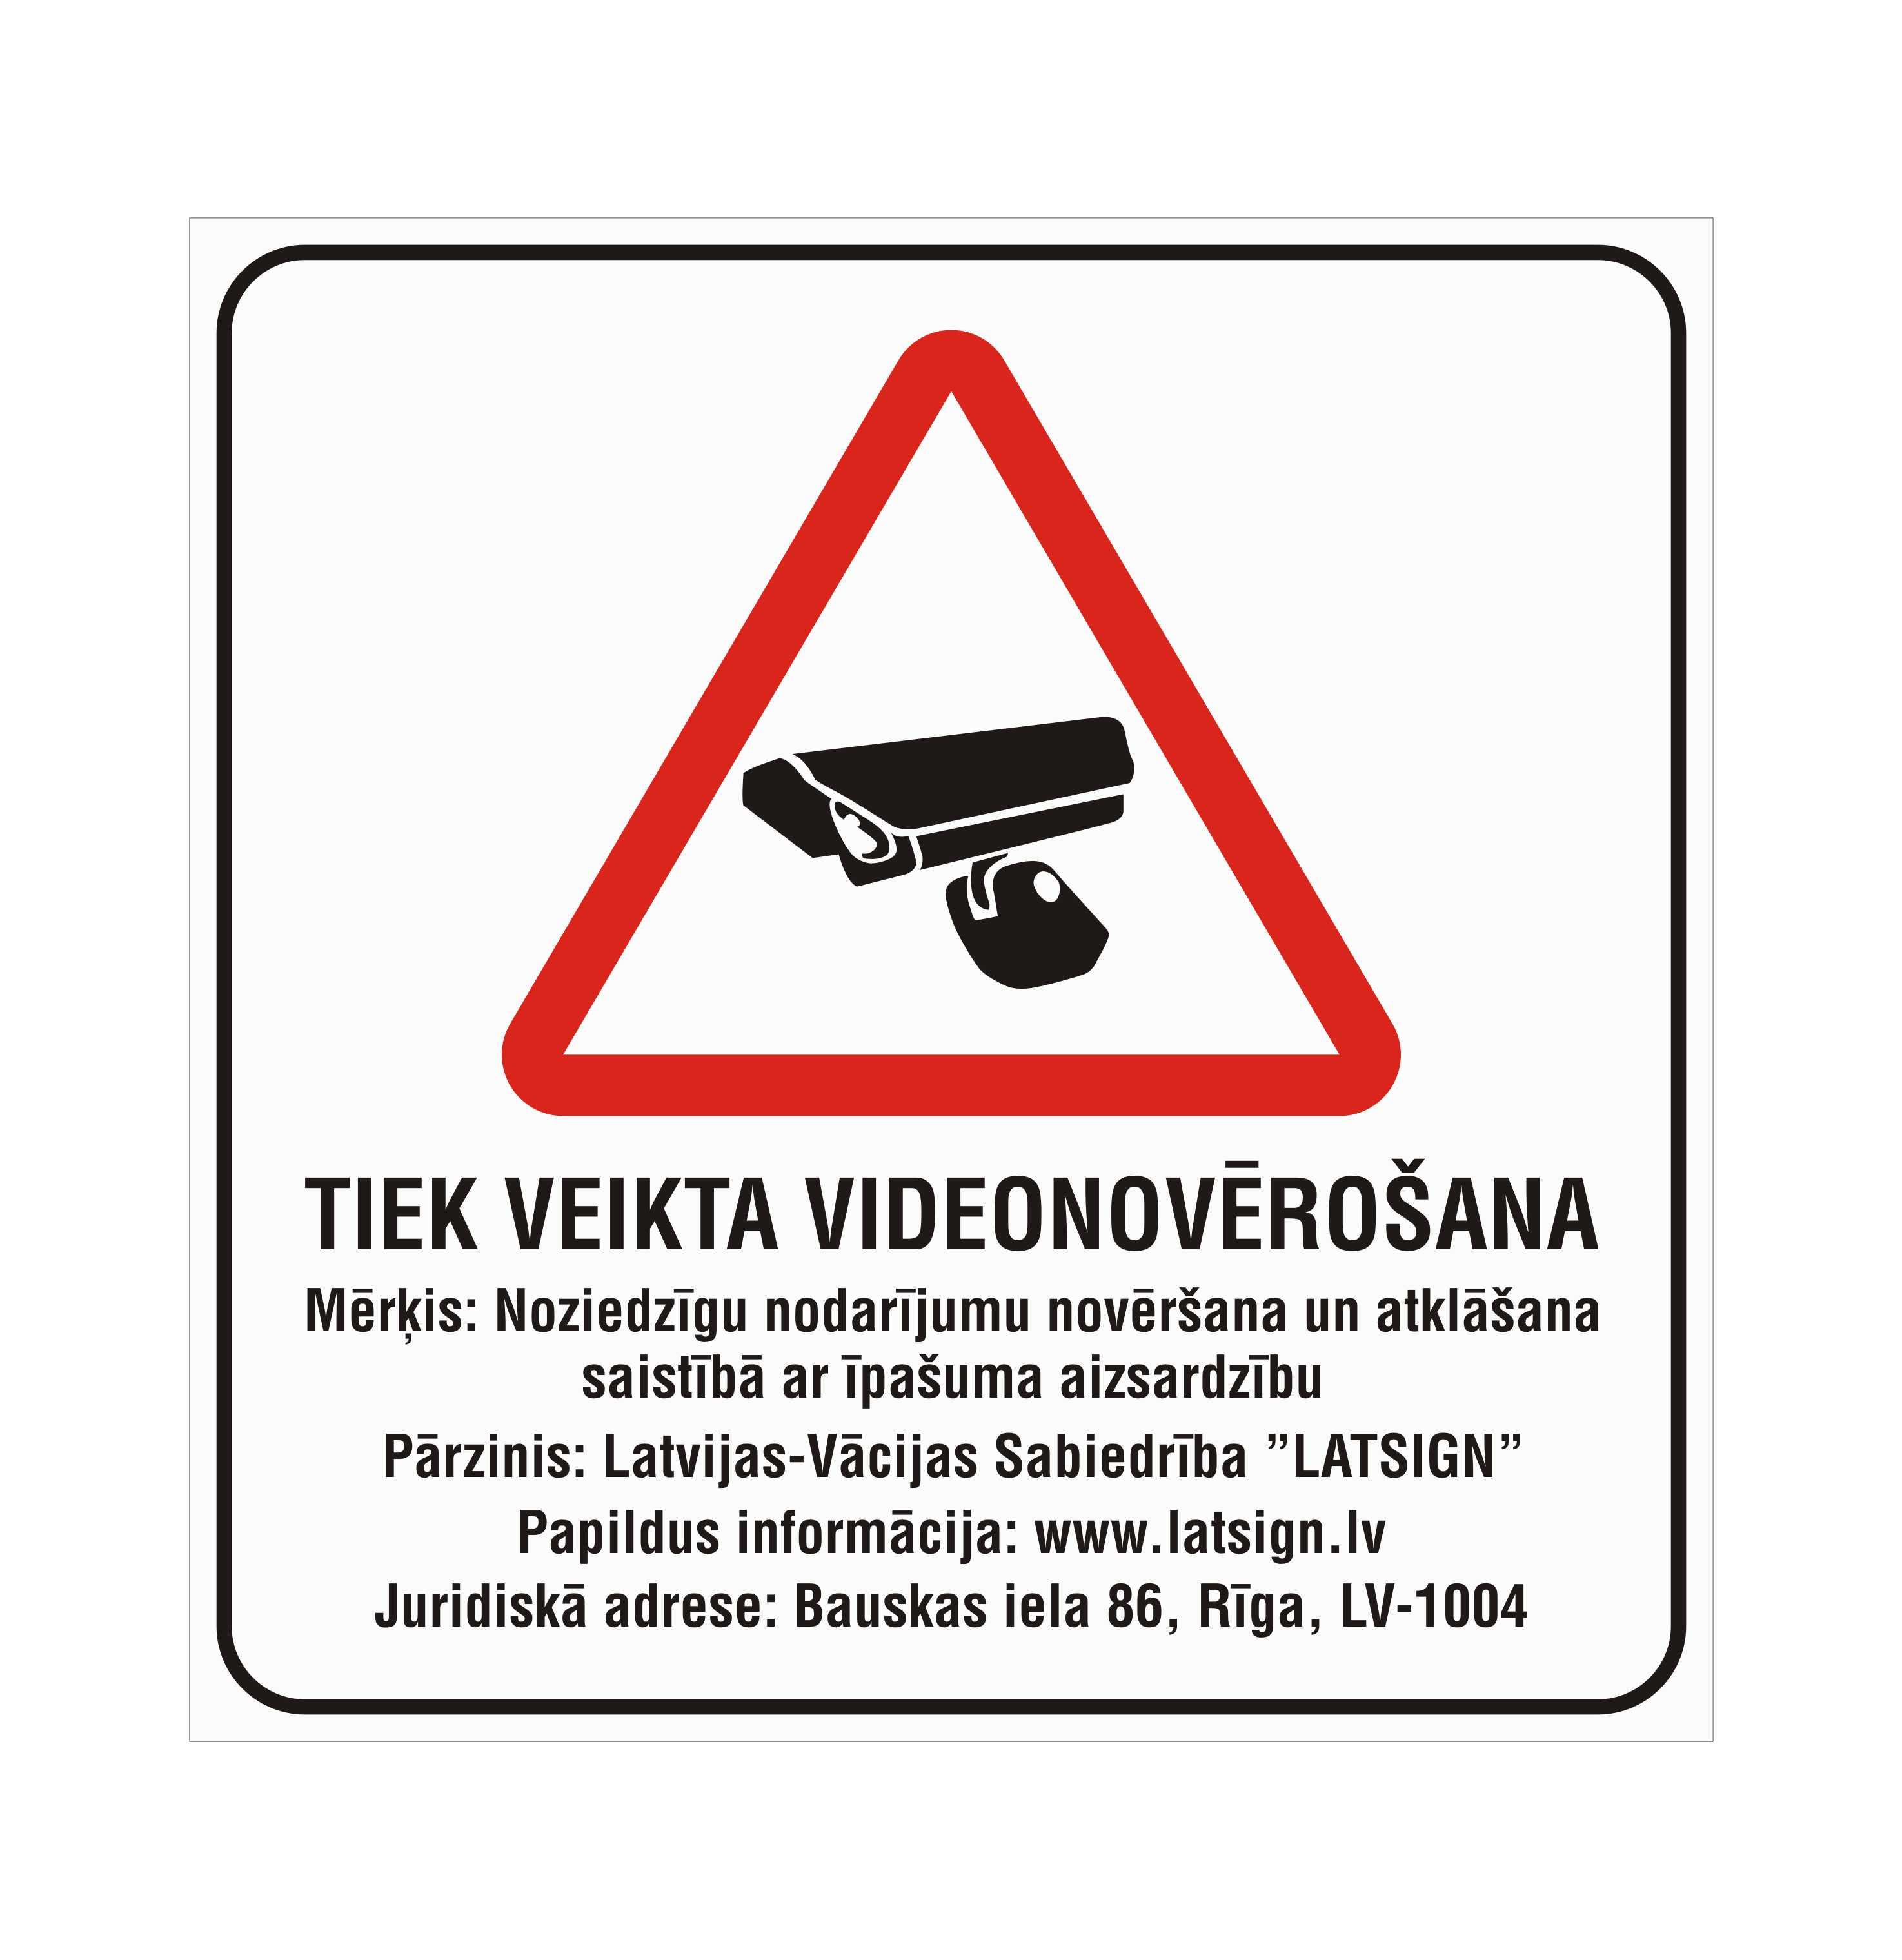 LATSIGN-informativa bridinajuma zime-Videonoverošana_VDAR_400x400